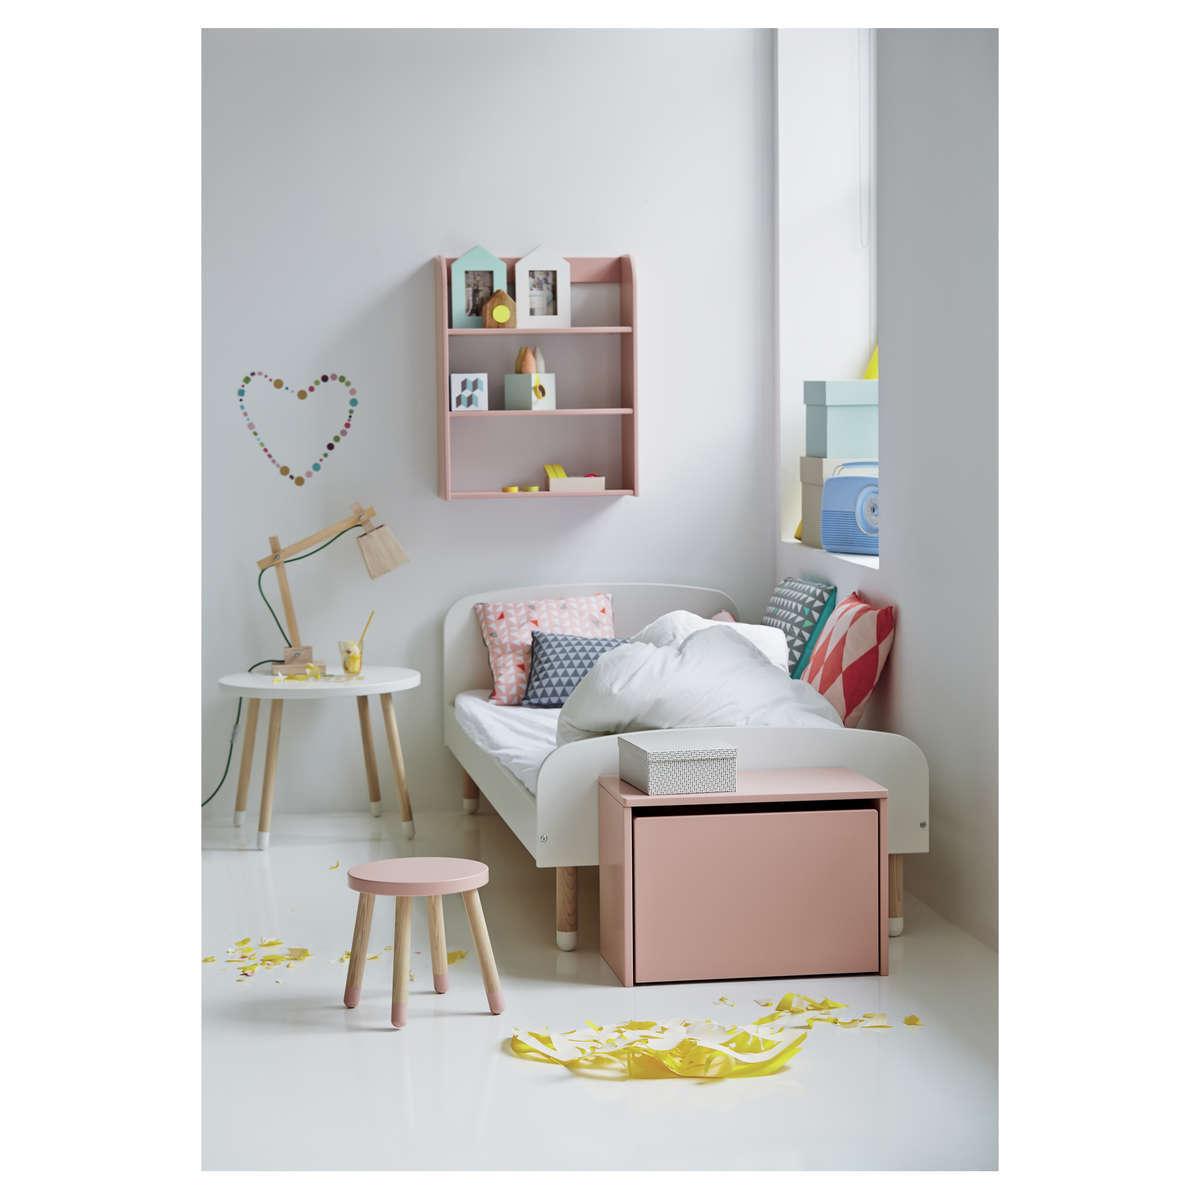 flexa coffre de rangement play rose rangement jouet. Black Bedroom Furniture Sets. Home Design Ideas